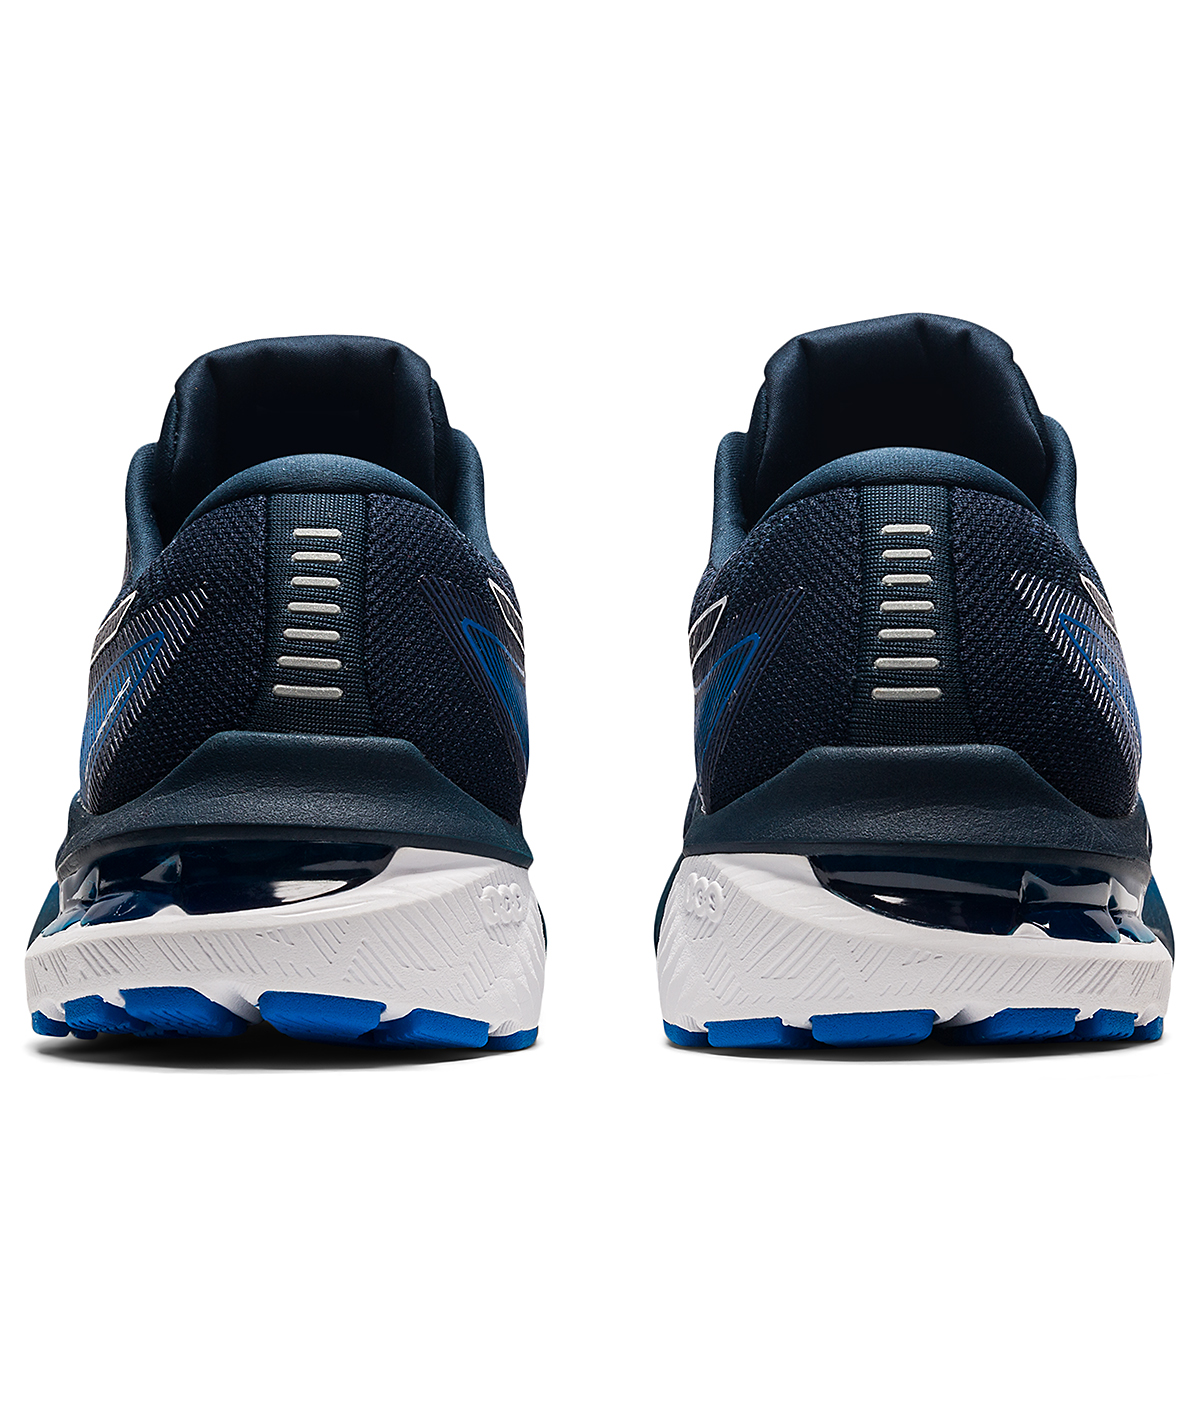 Men's Asics GT-2000 10 Running Shoe - Color: Thunder Blue/French Blue - Size: 7 - Width: Regular, Thunder Blue/French Blue, large, image 5